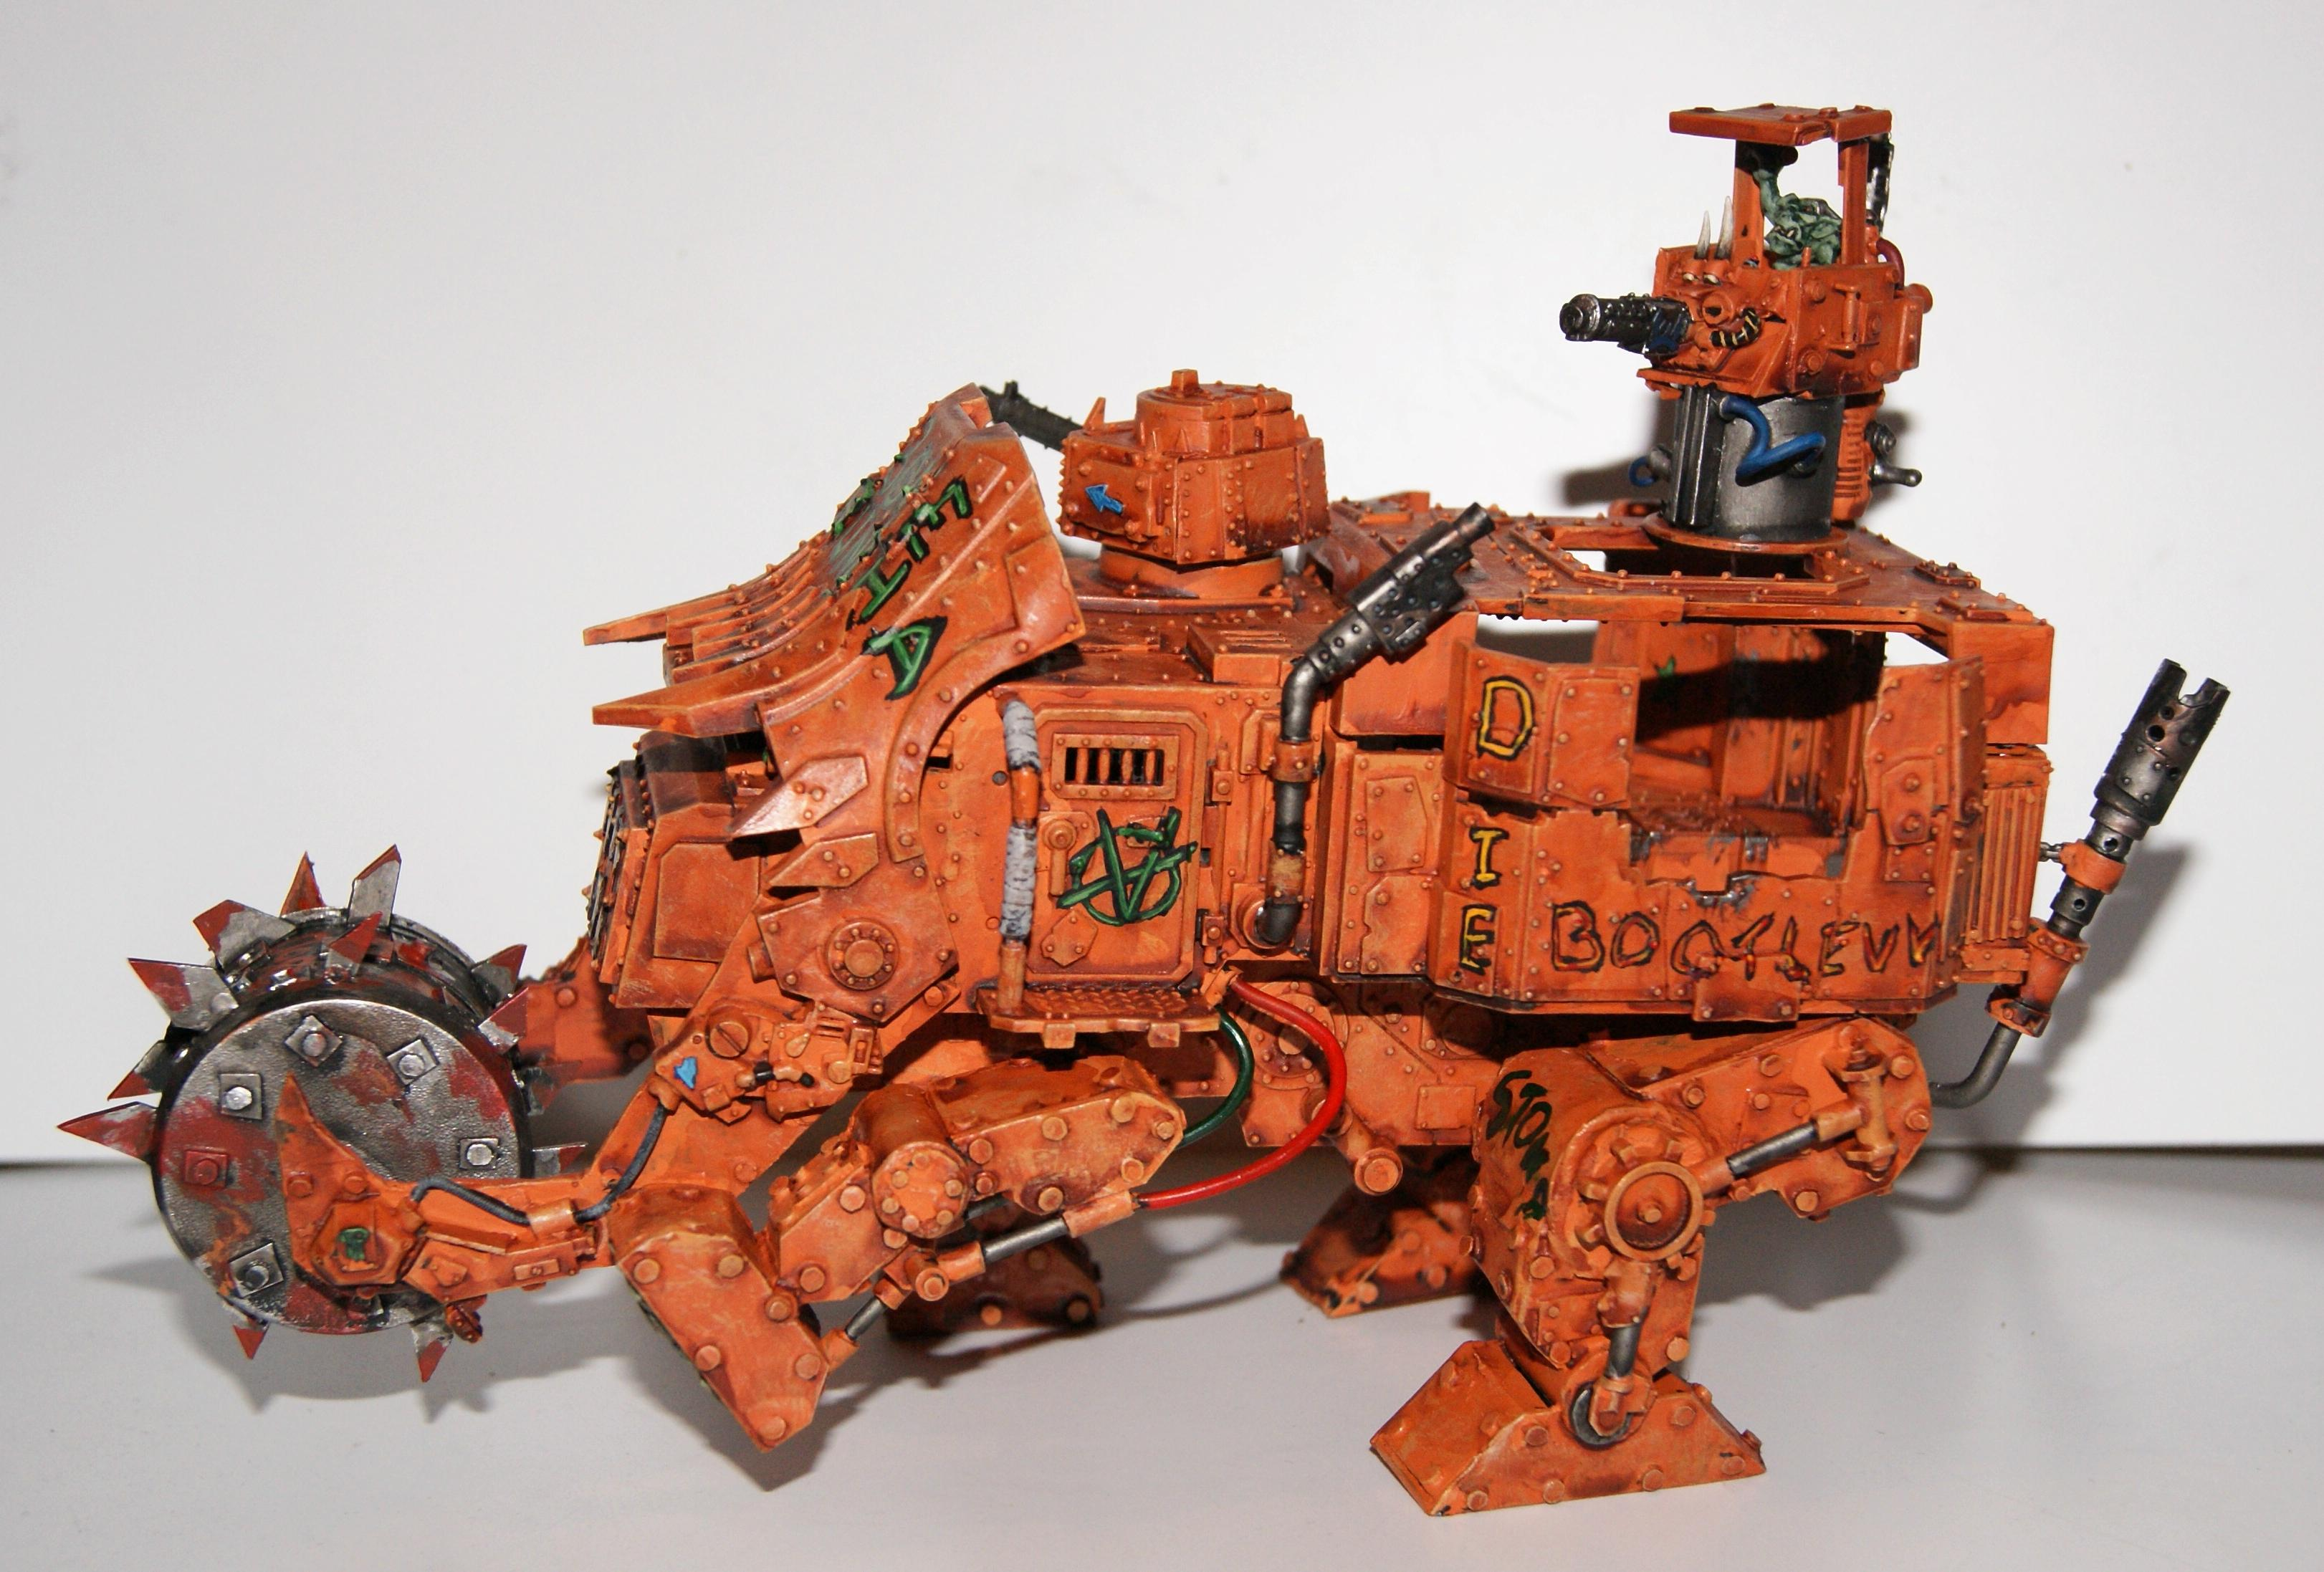 Battlewagon, Conversion, Grot Rebellion, Grot Rebels, Warhammer 40,000, Work In Progress